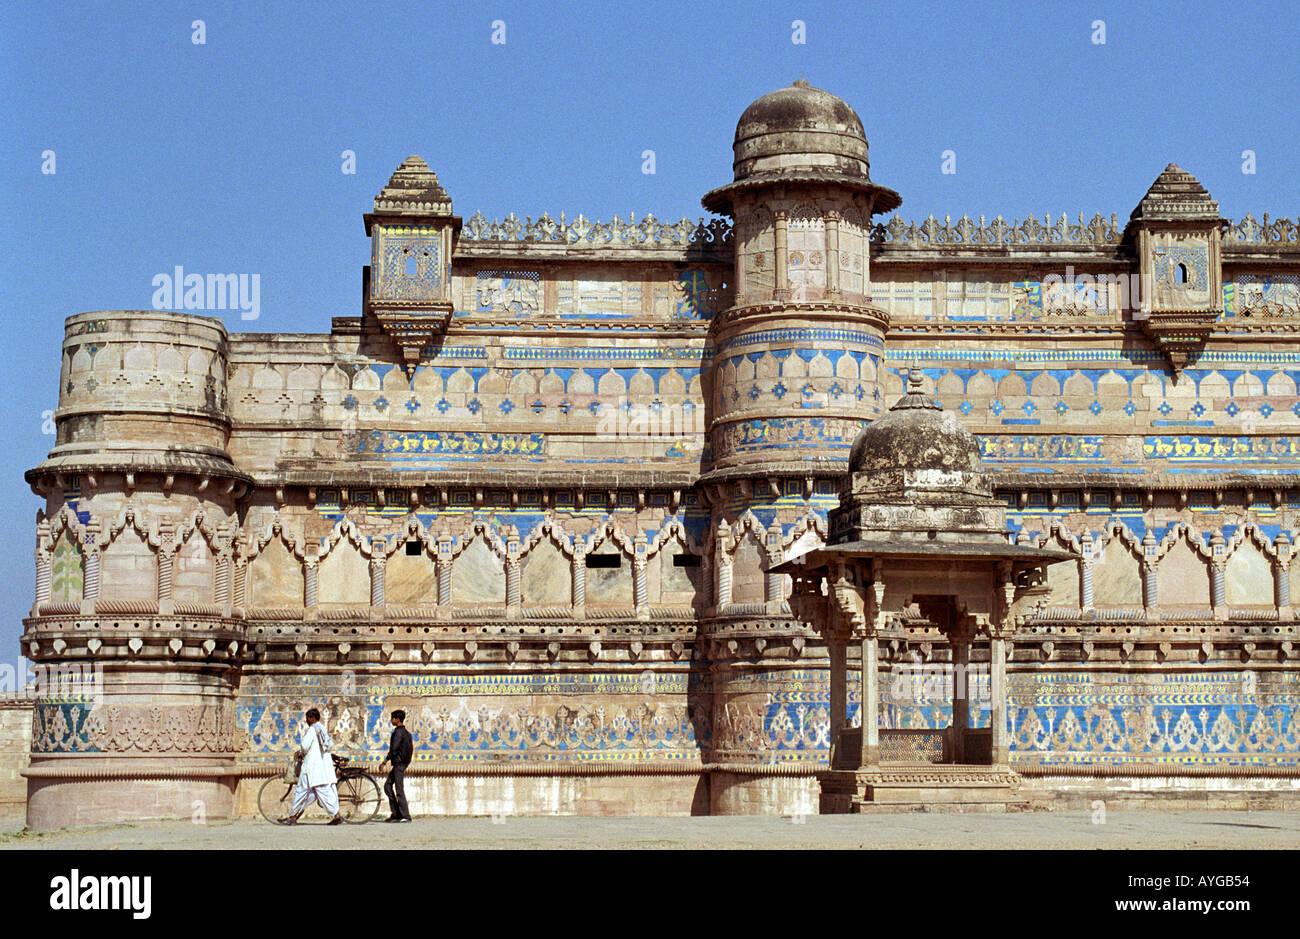 Man Singh Palace Fort De Gwalior Inde Banque Dimages Photo Stock